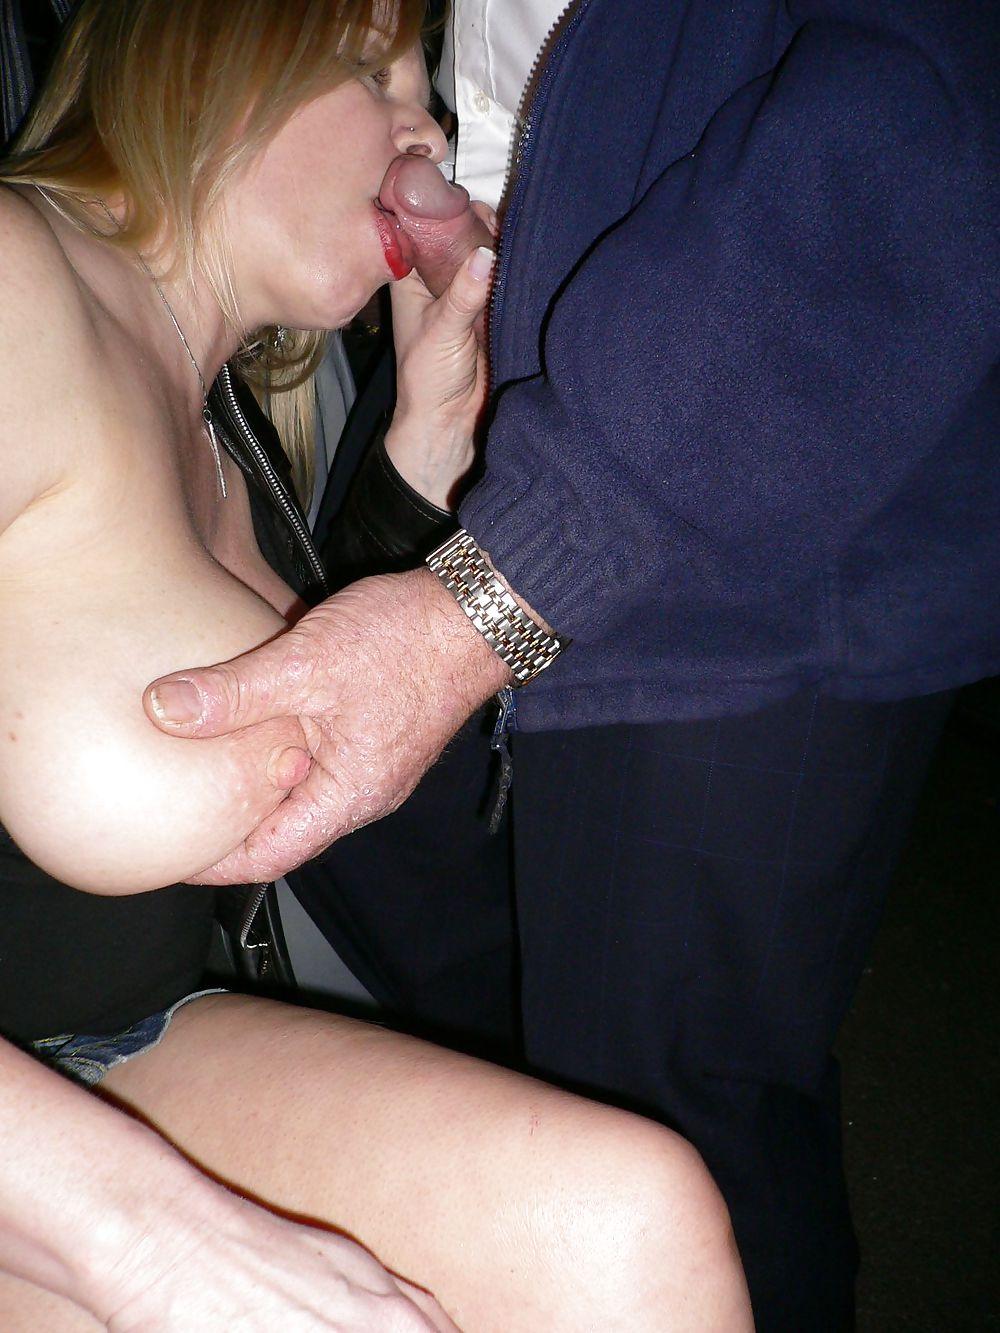 English amateur sluts, cilip bbw very young girl